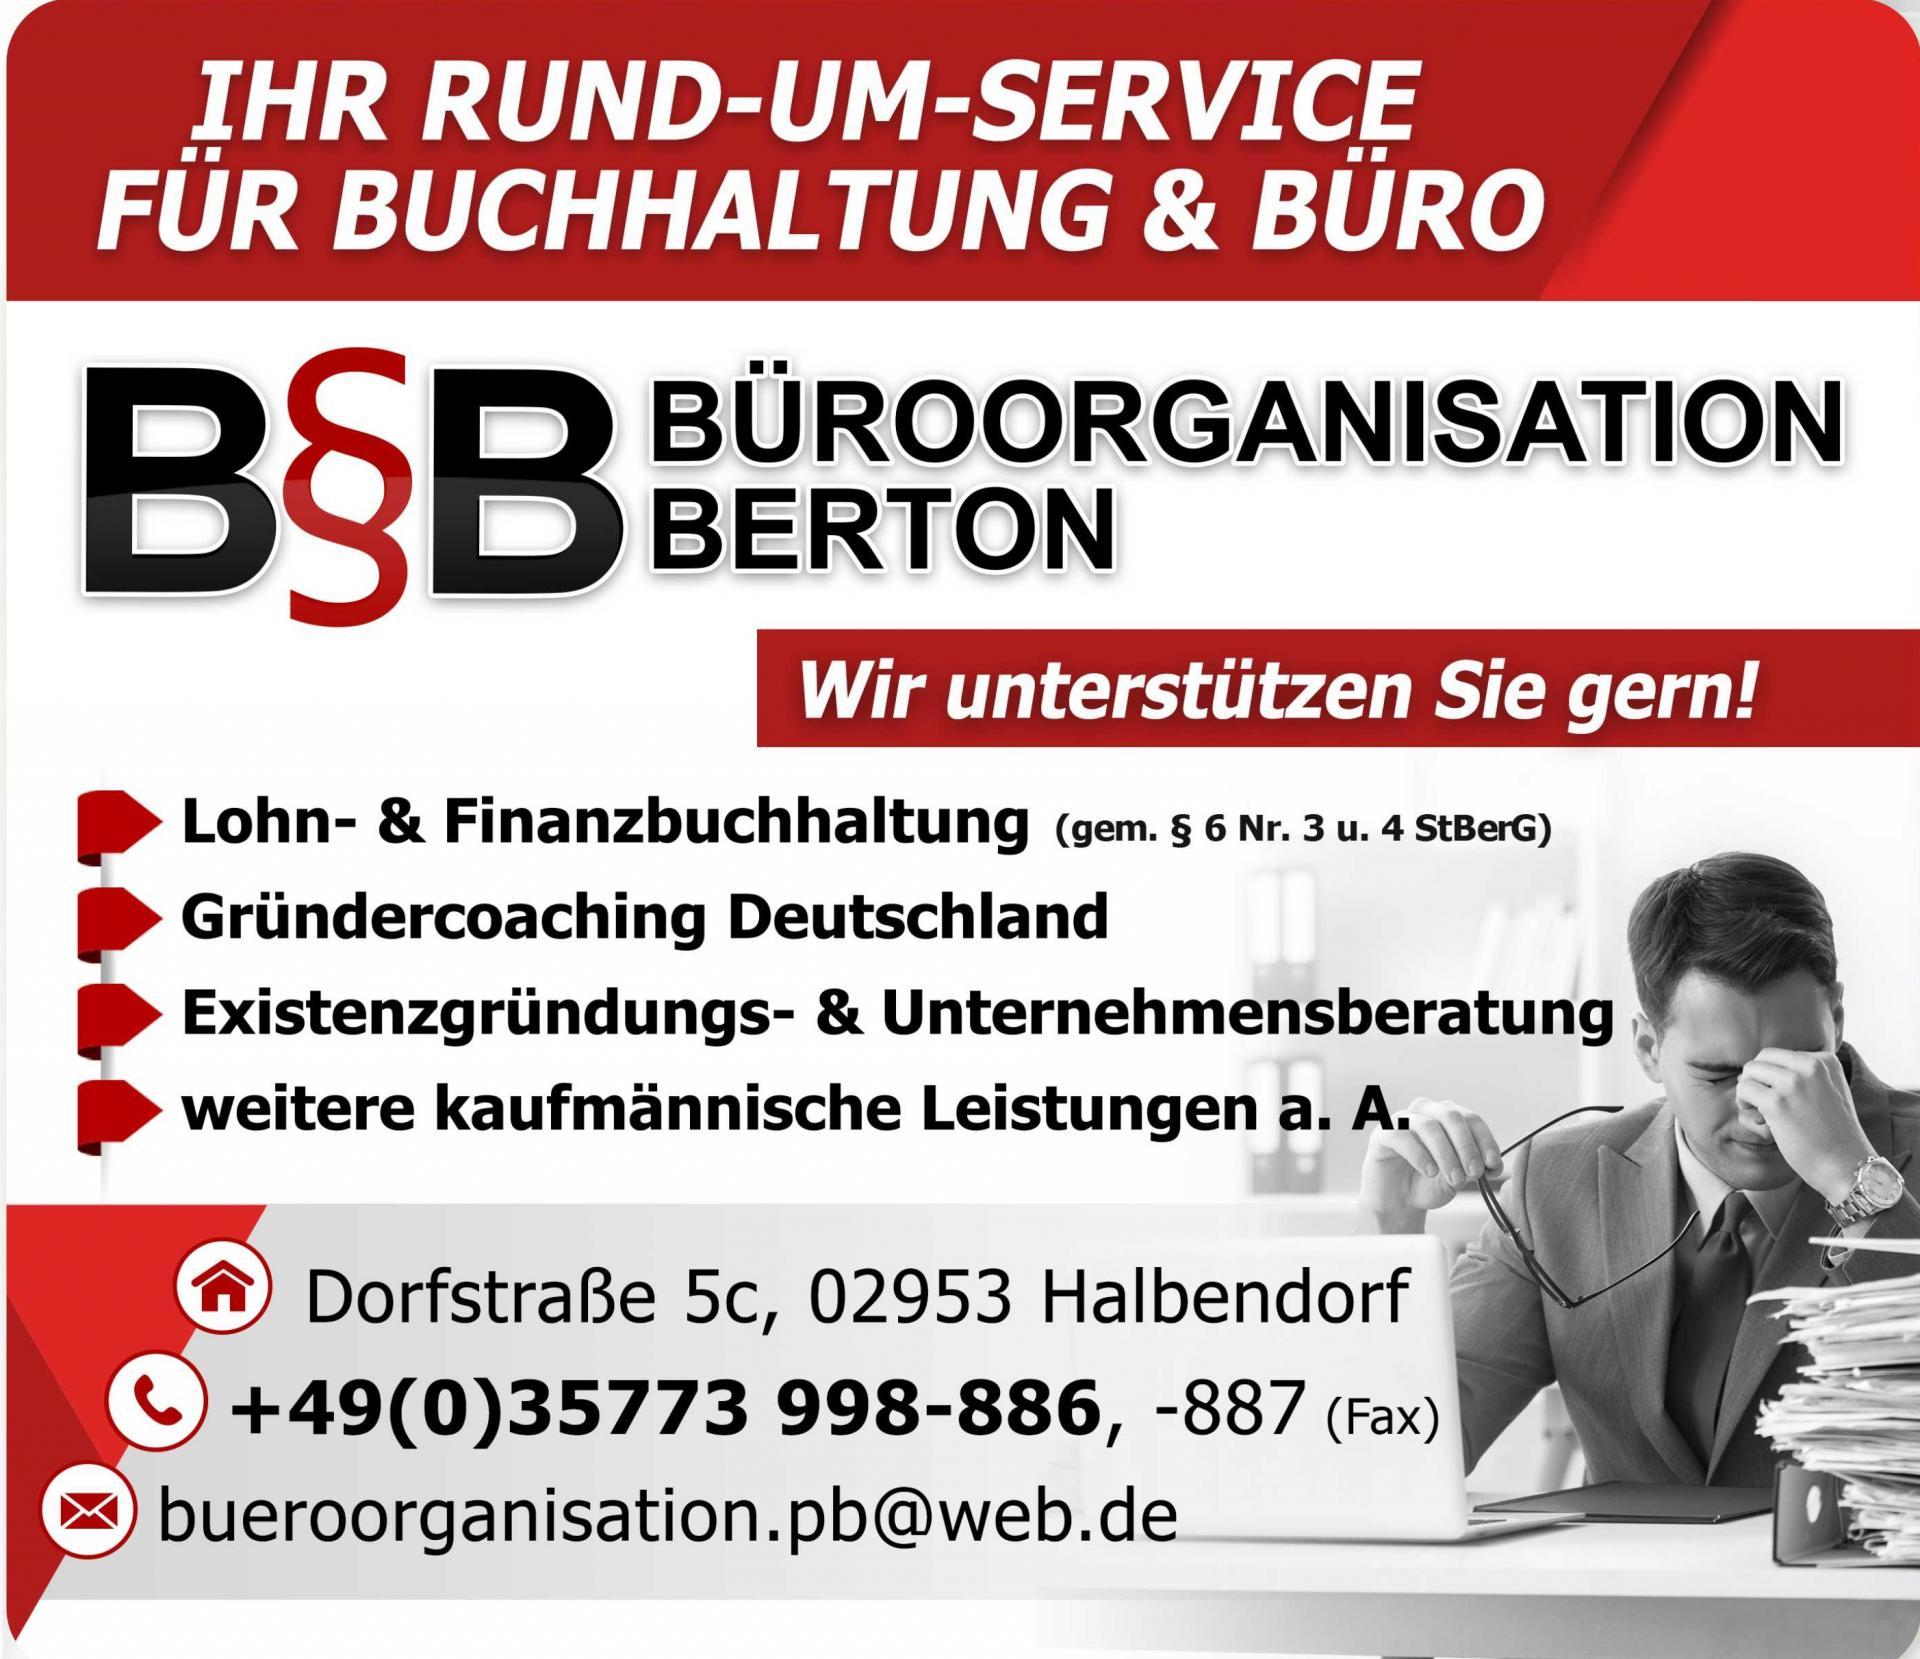 BB Berton